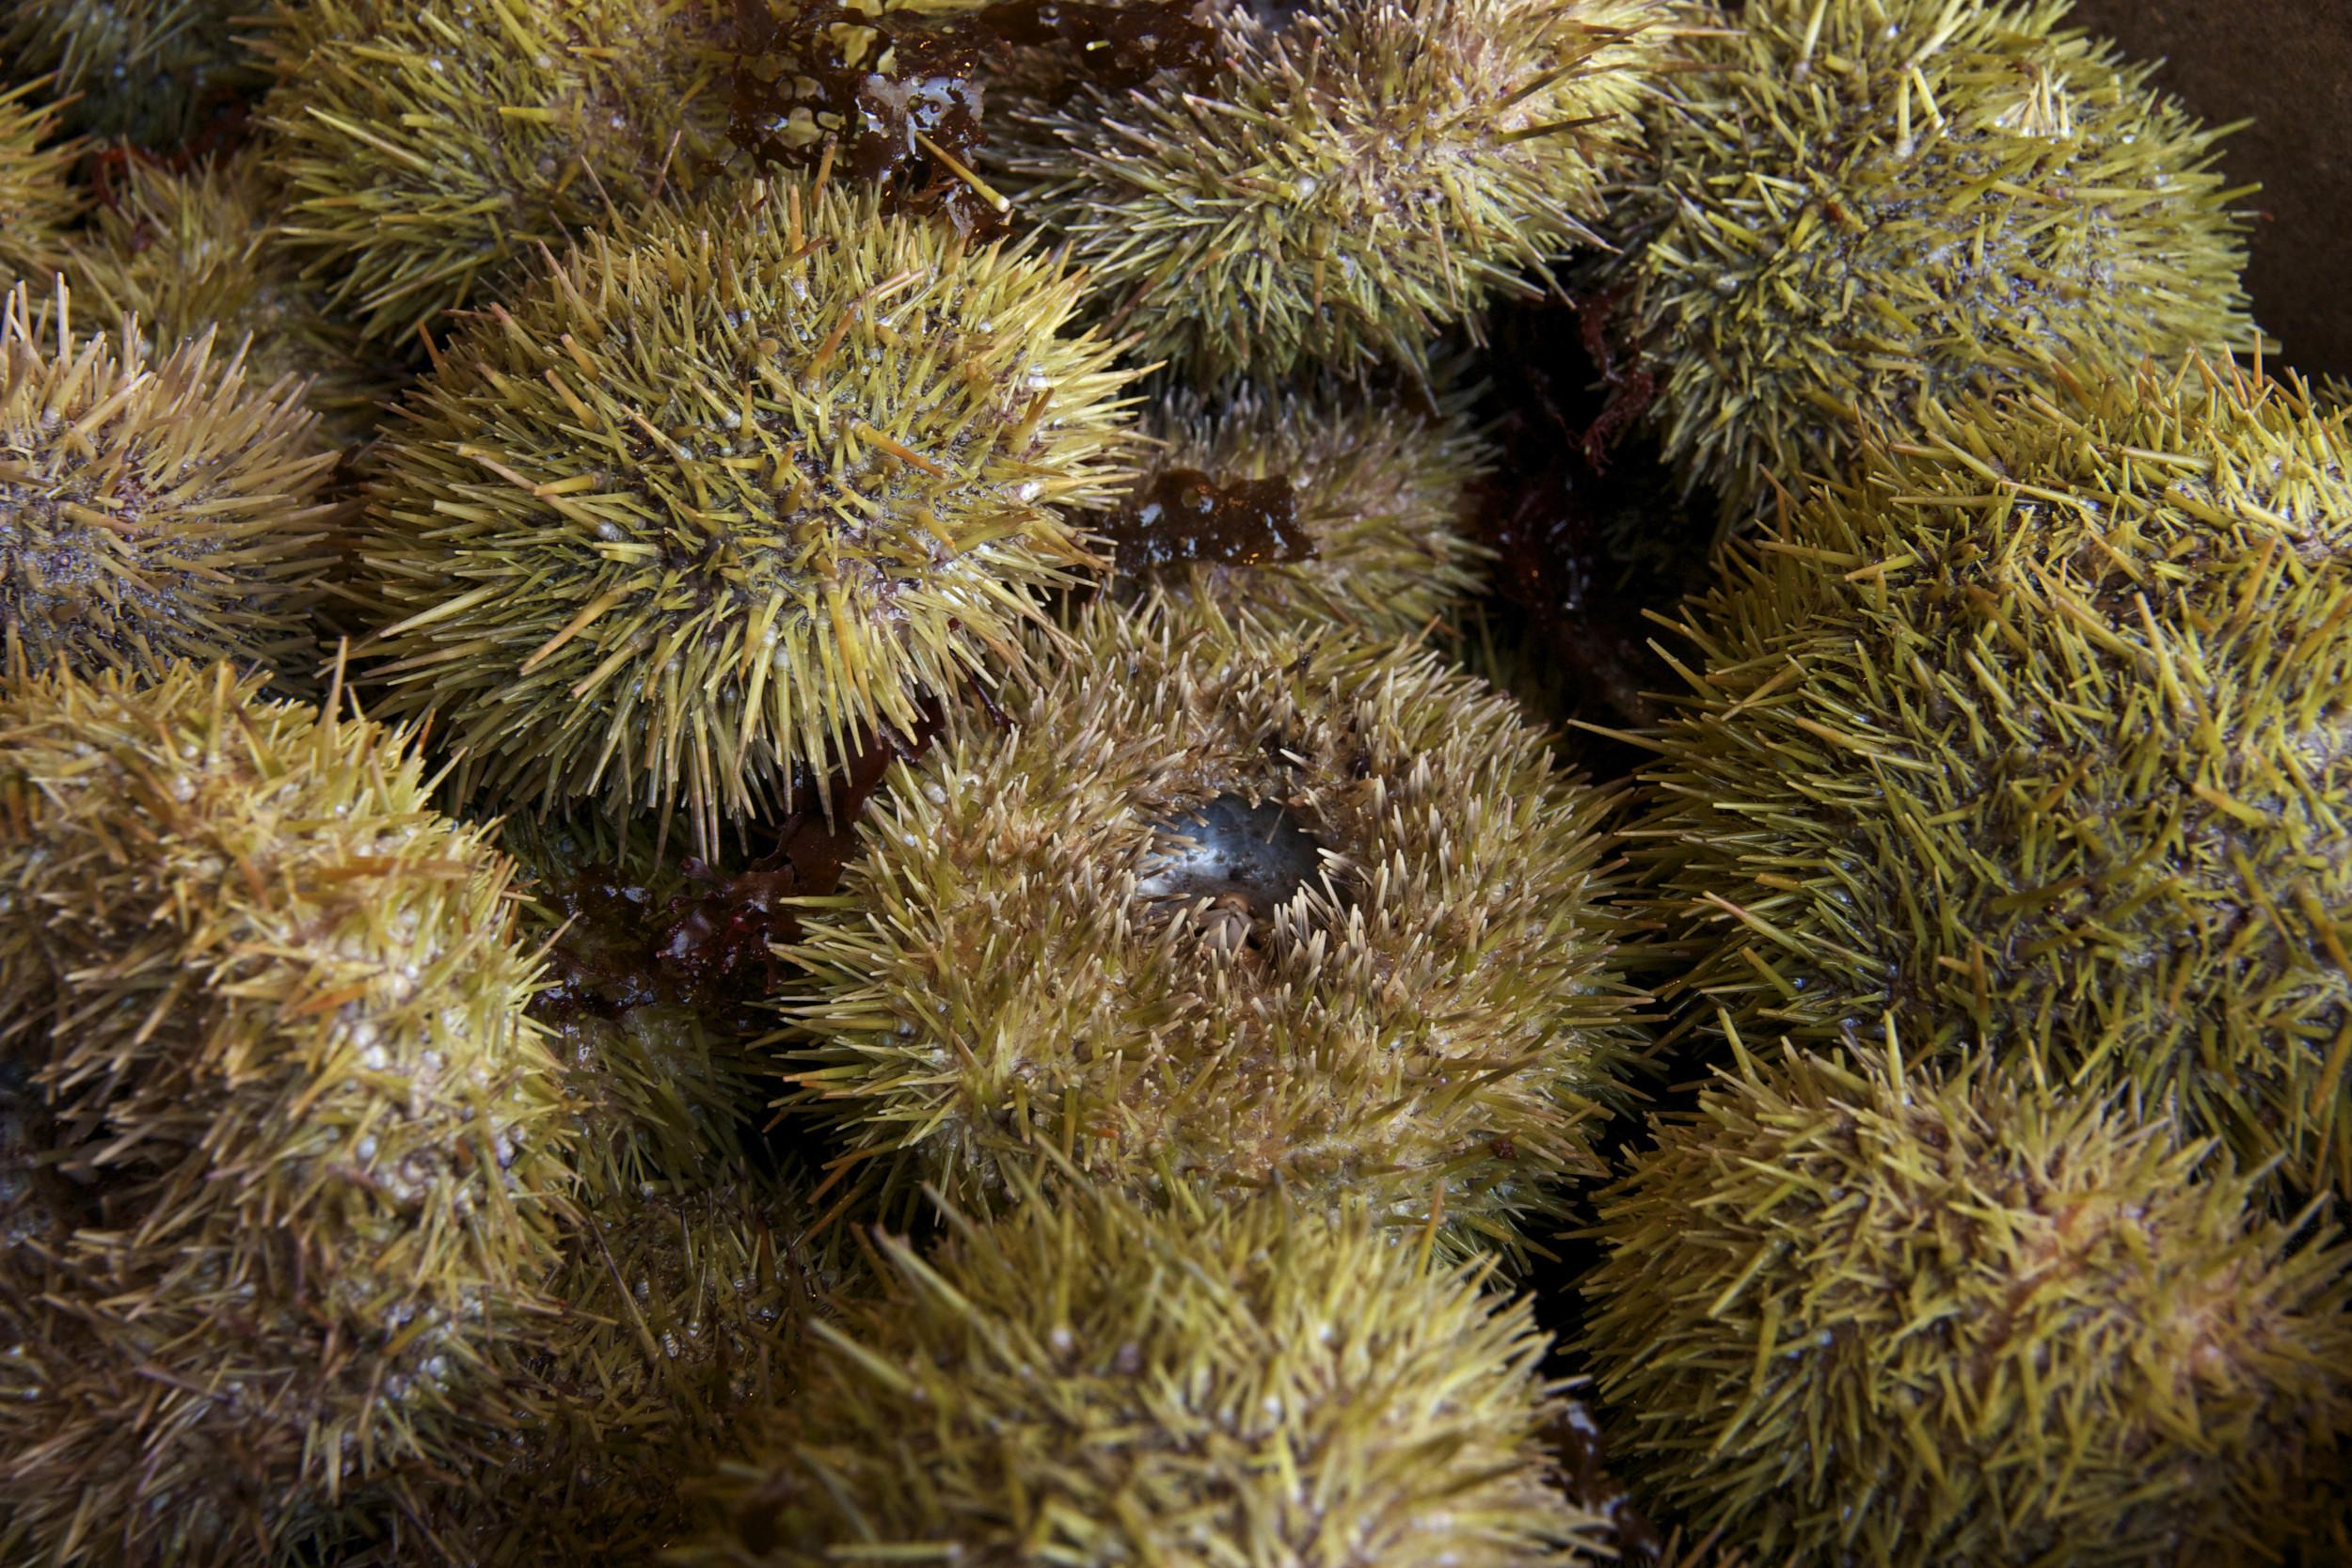 Pangea Shellfish Sea Urchin.jpg